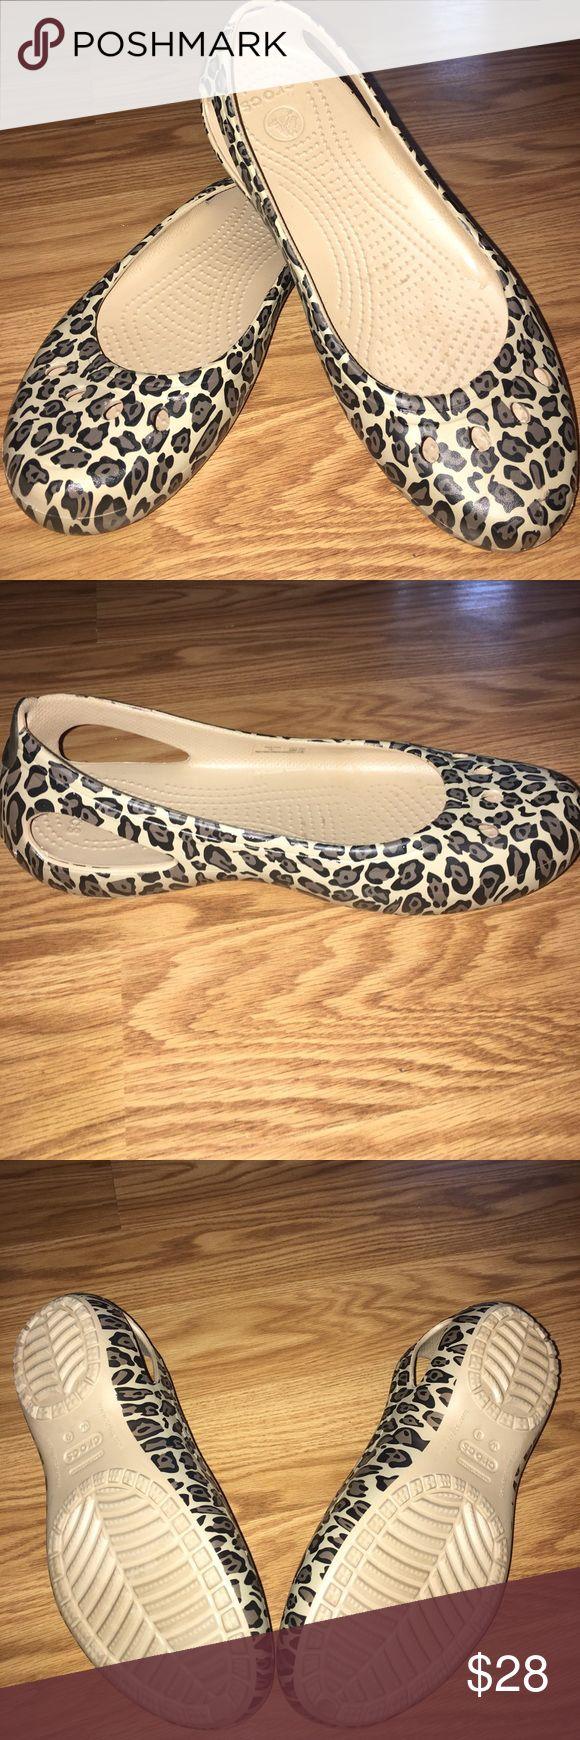 CROCS- Kadee Animal print flats Brand new never worn CROCS• Make me an offer! CROCS Shoes Flats & Loafers